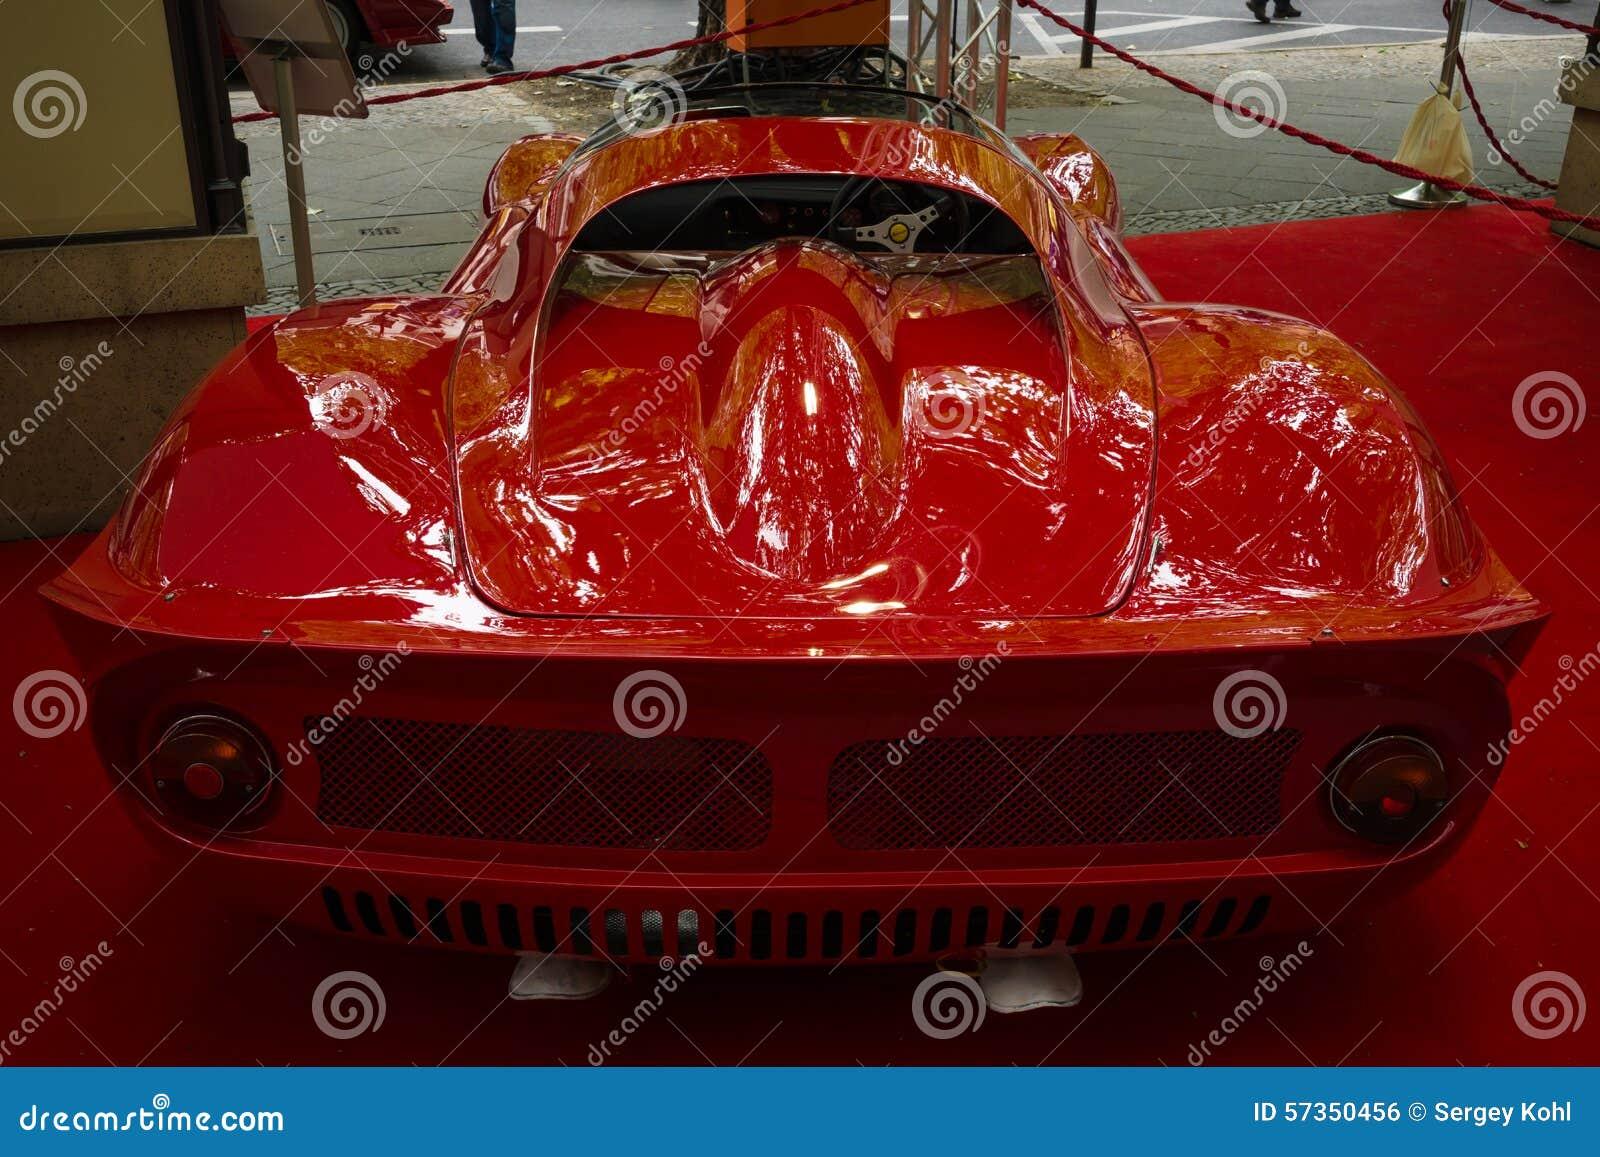 Sports car Ferrari Dino 206 SP (Sports prototype), 1966